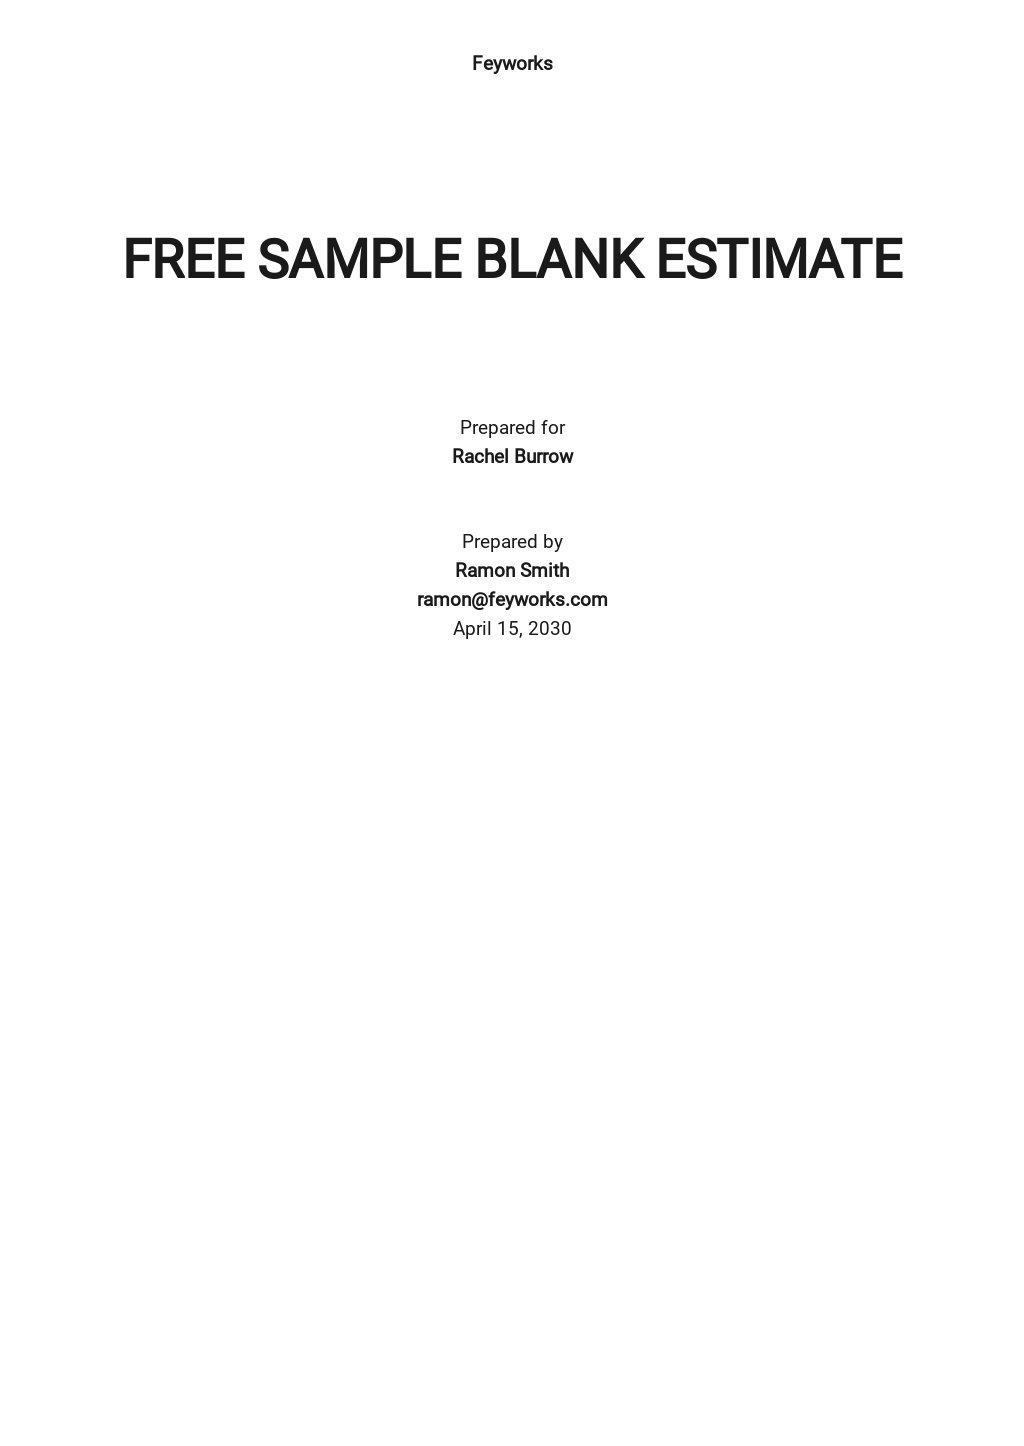 Free Sample Blank Estimate Template.jpe